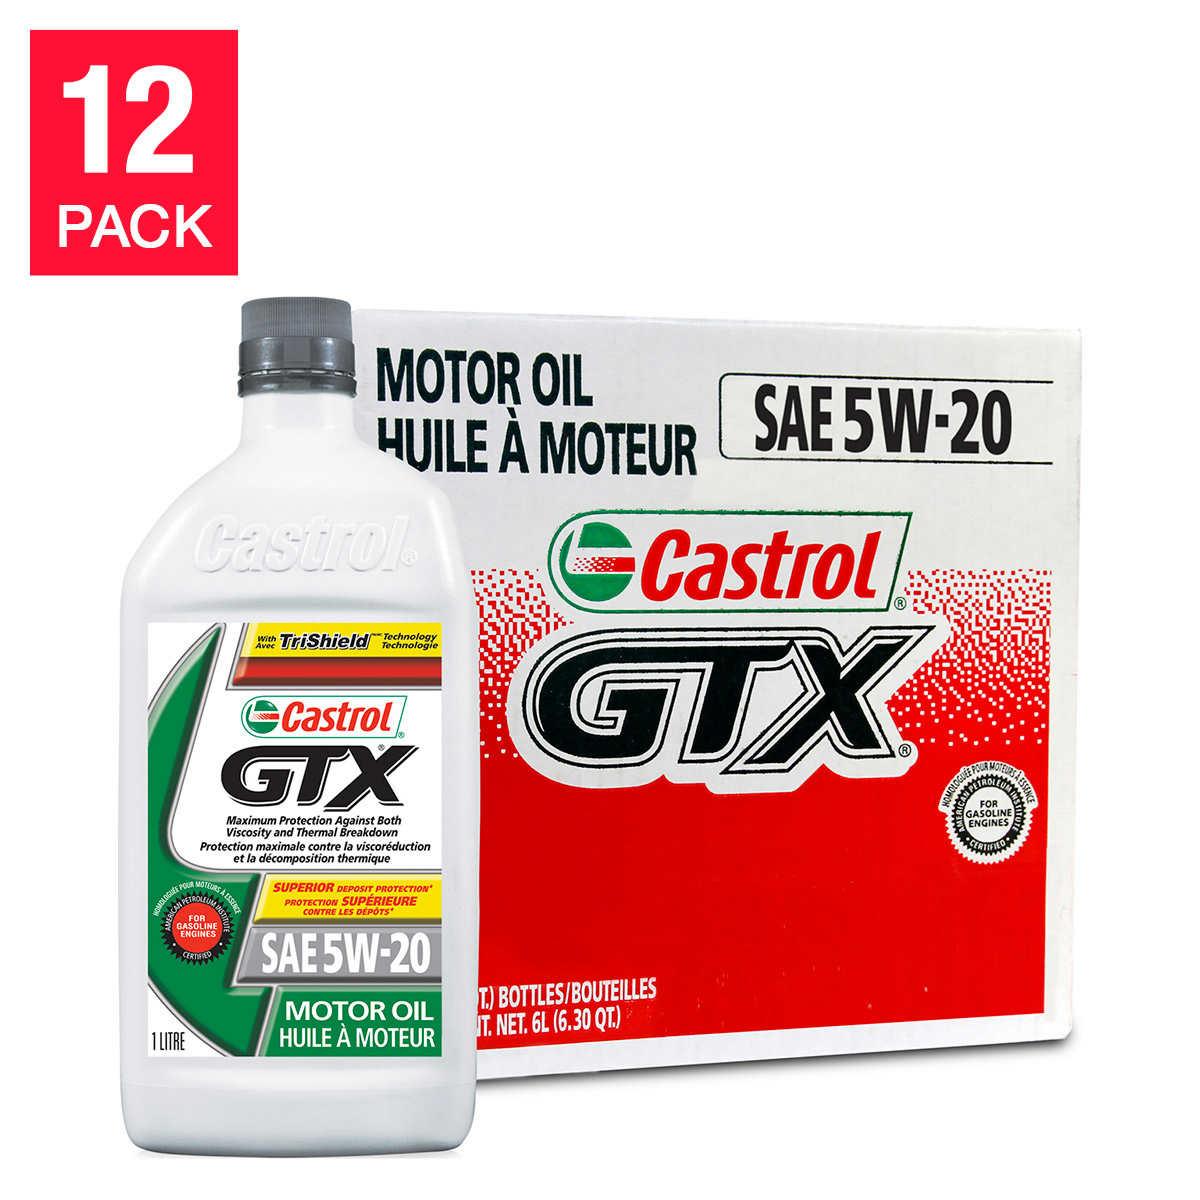 Castrol gtx 5w20 motor oil 12 x 1 l